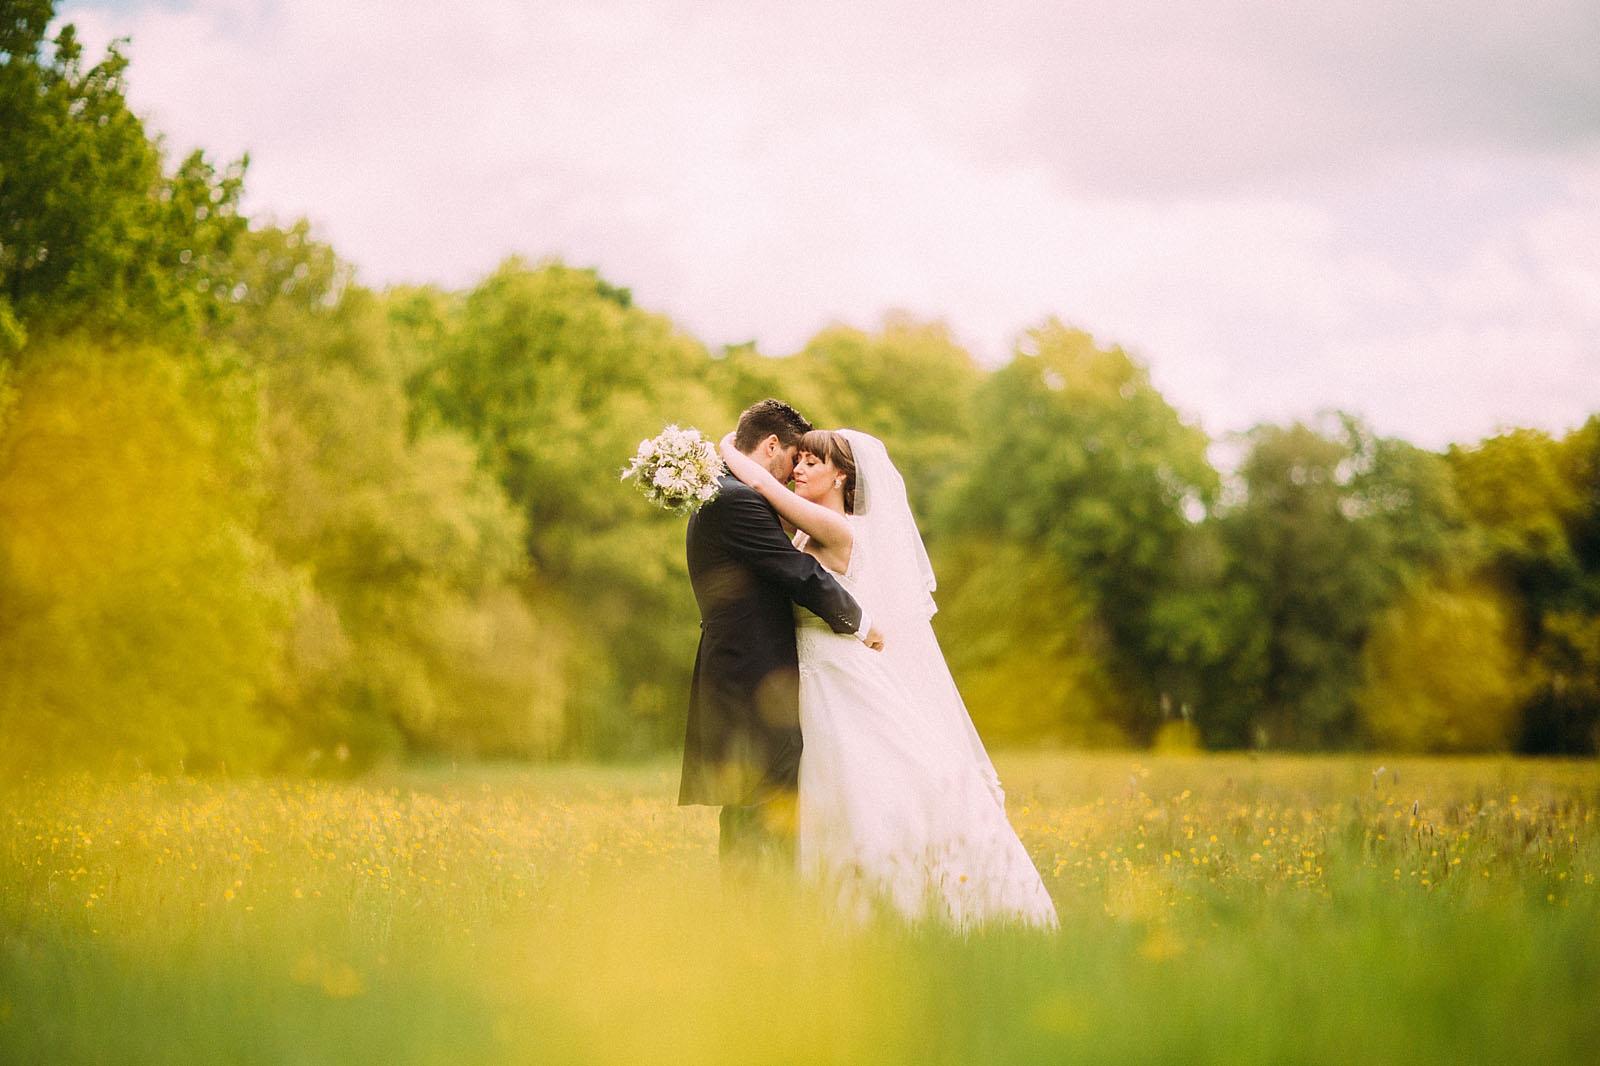 Lawson_Best_Wedding_2015_143